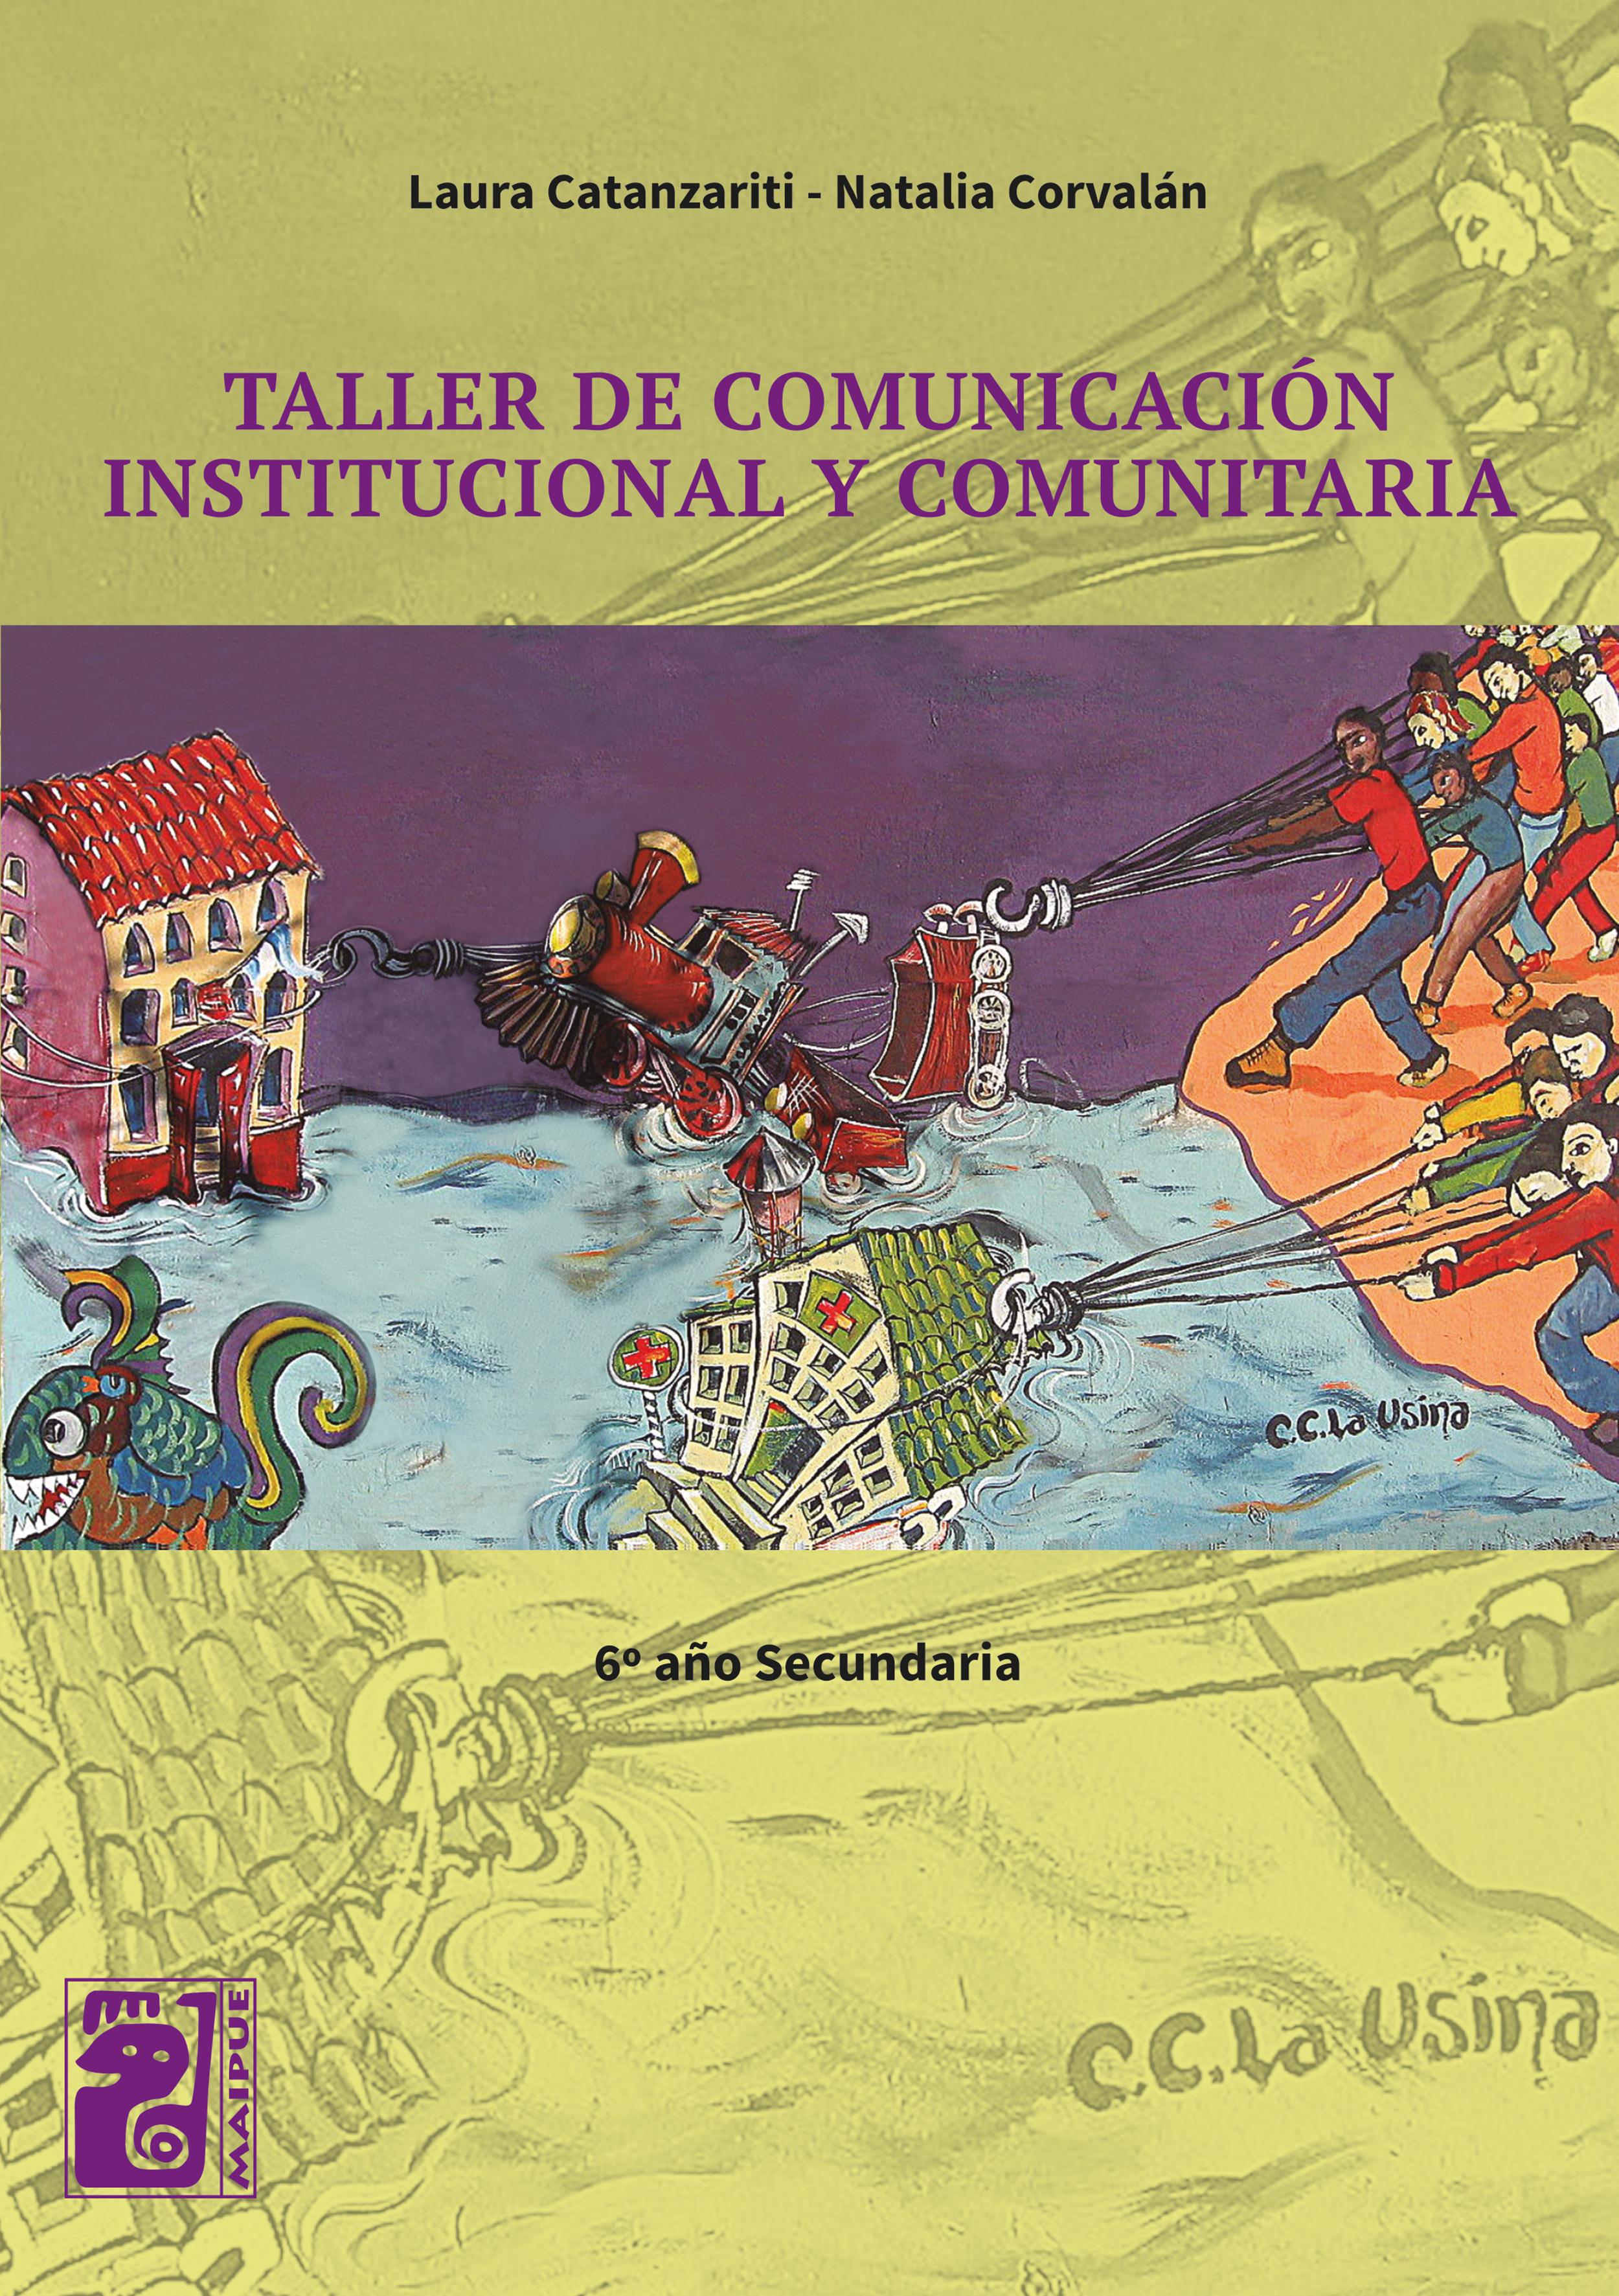 Taller de comunicación institucional y comunitaria